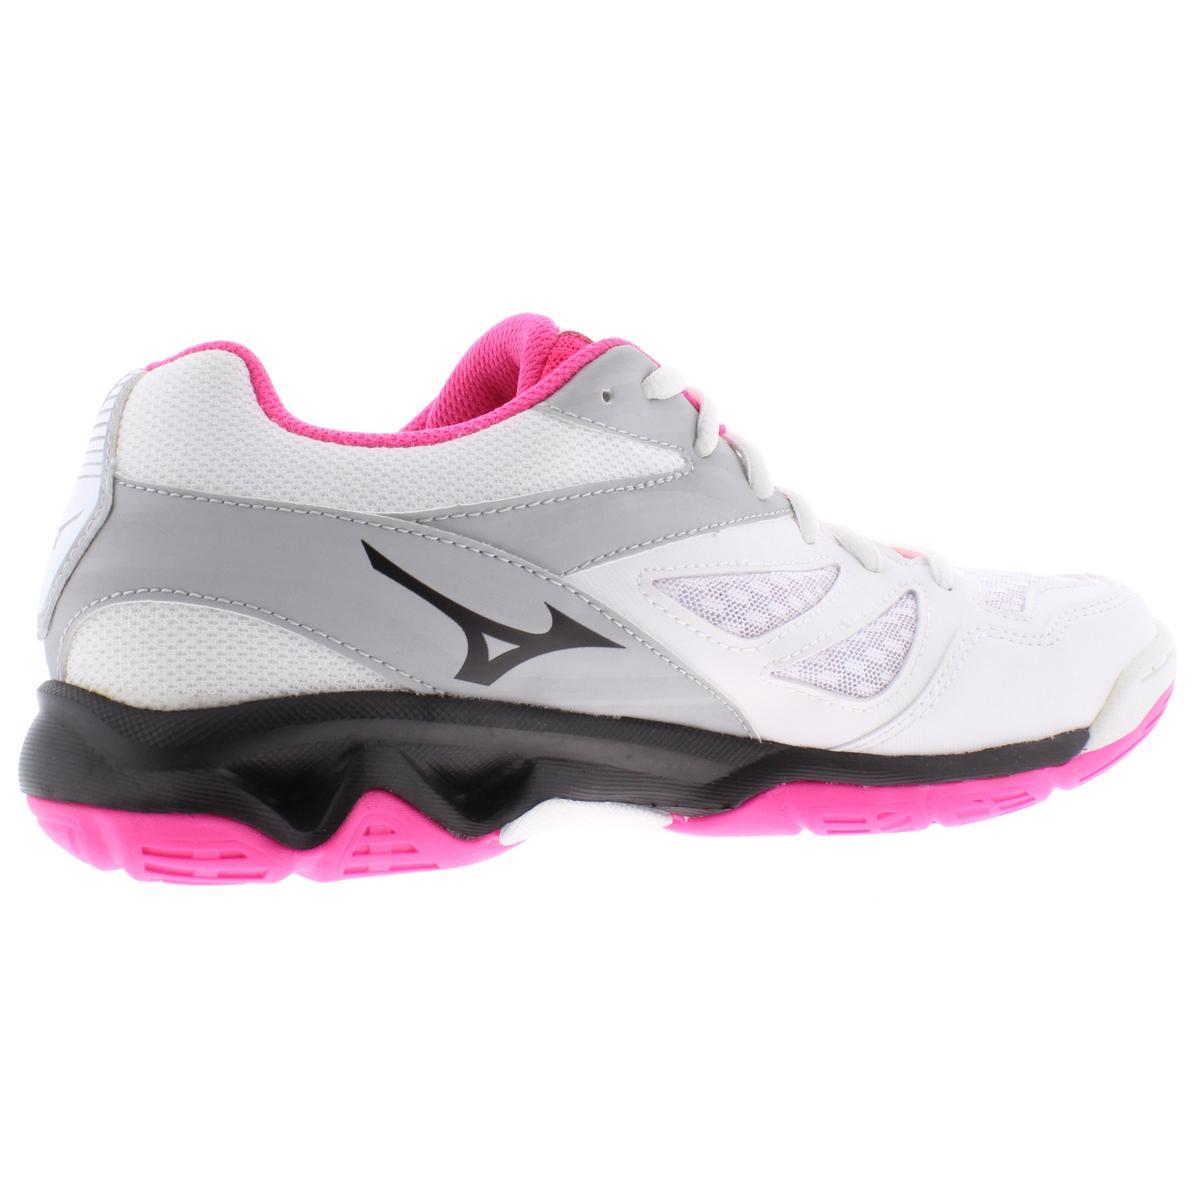 Mizuno-Womens-Thunder-Blade-Low-Top-Non-Marking-Sneakers-Shoes-BHFO-9051 thumbnail 9